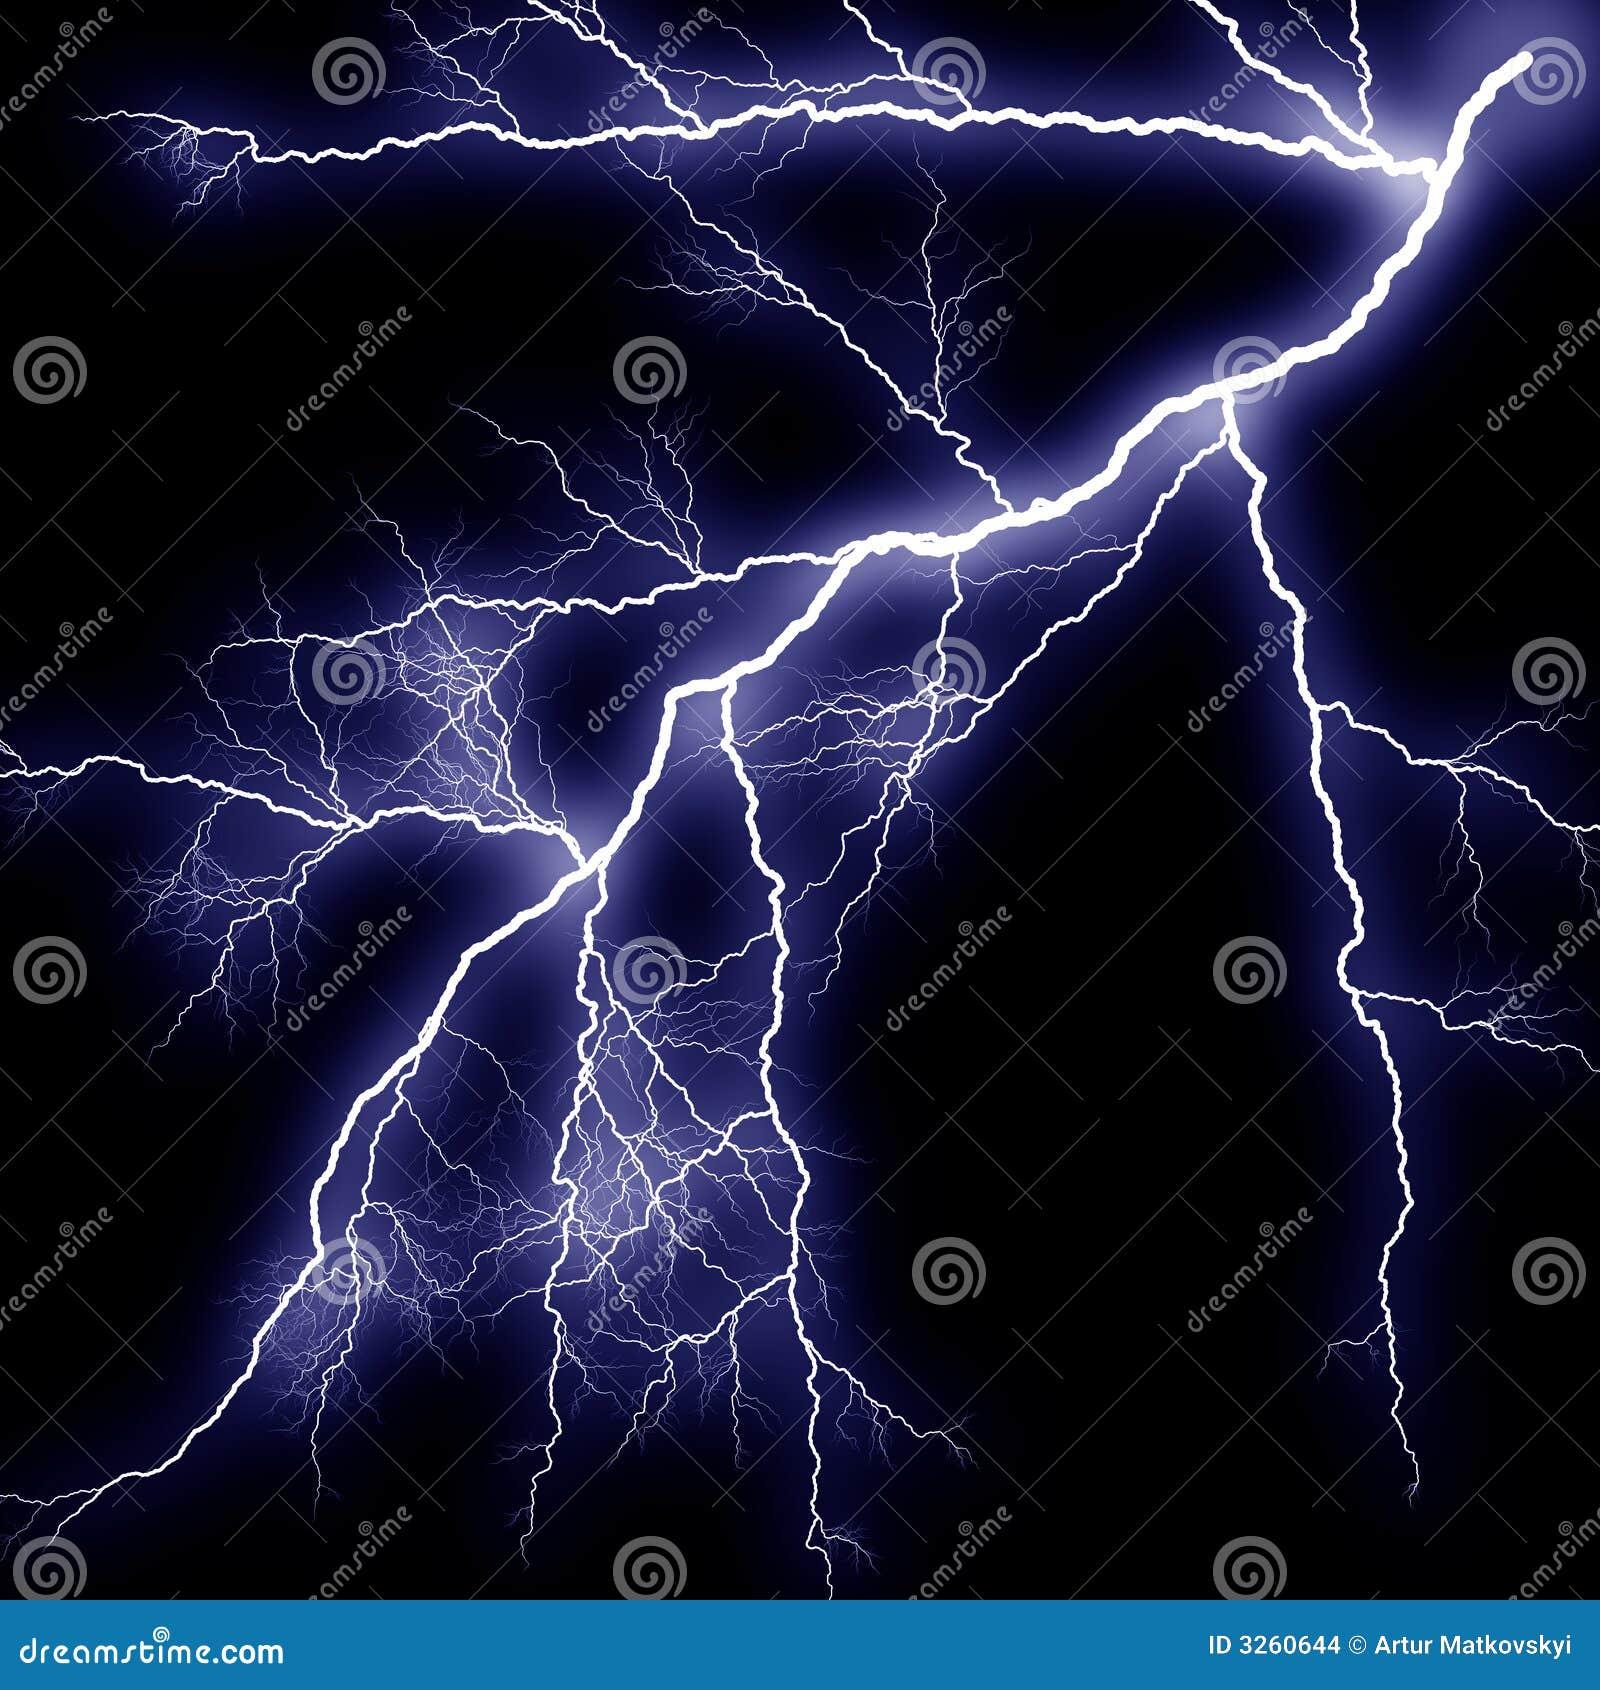 Scary Lightning Stock Images Image 3260644